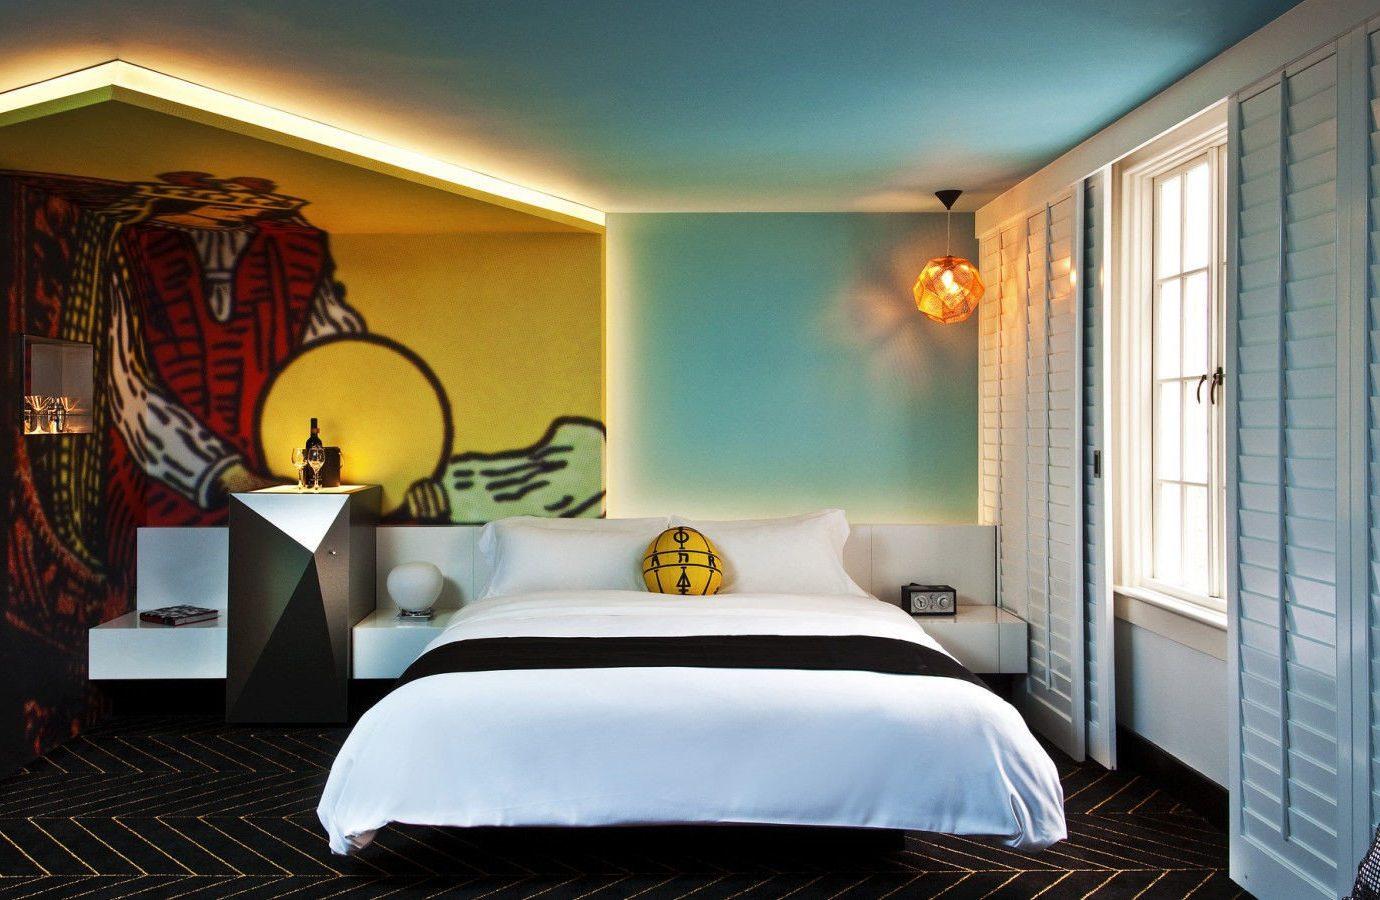 Hotels indoor wall bed room ceiling Suite interior design Bedroom home real estate hotel window boutique hotel furniture